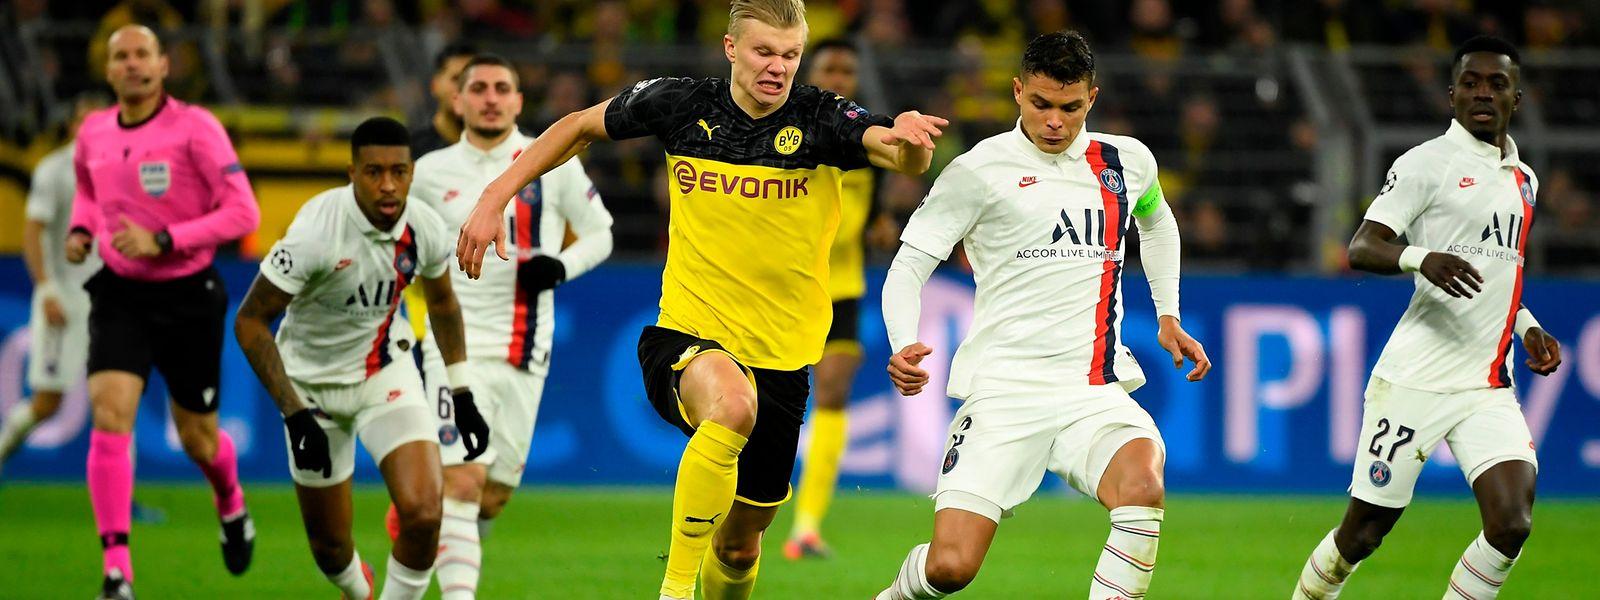 Dortmunds Erling Haaland, hier gegen den Pariser Thiago Silva (r.), erzielt die beiden Dortmunder Treffer.